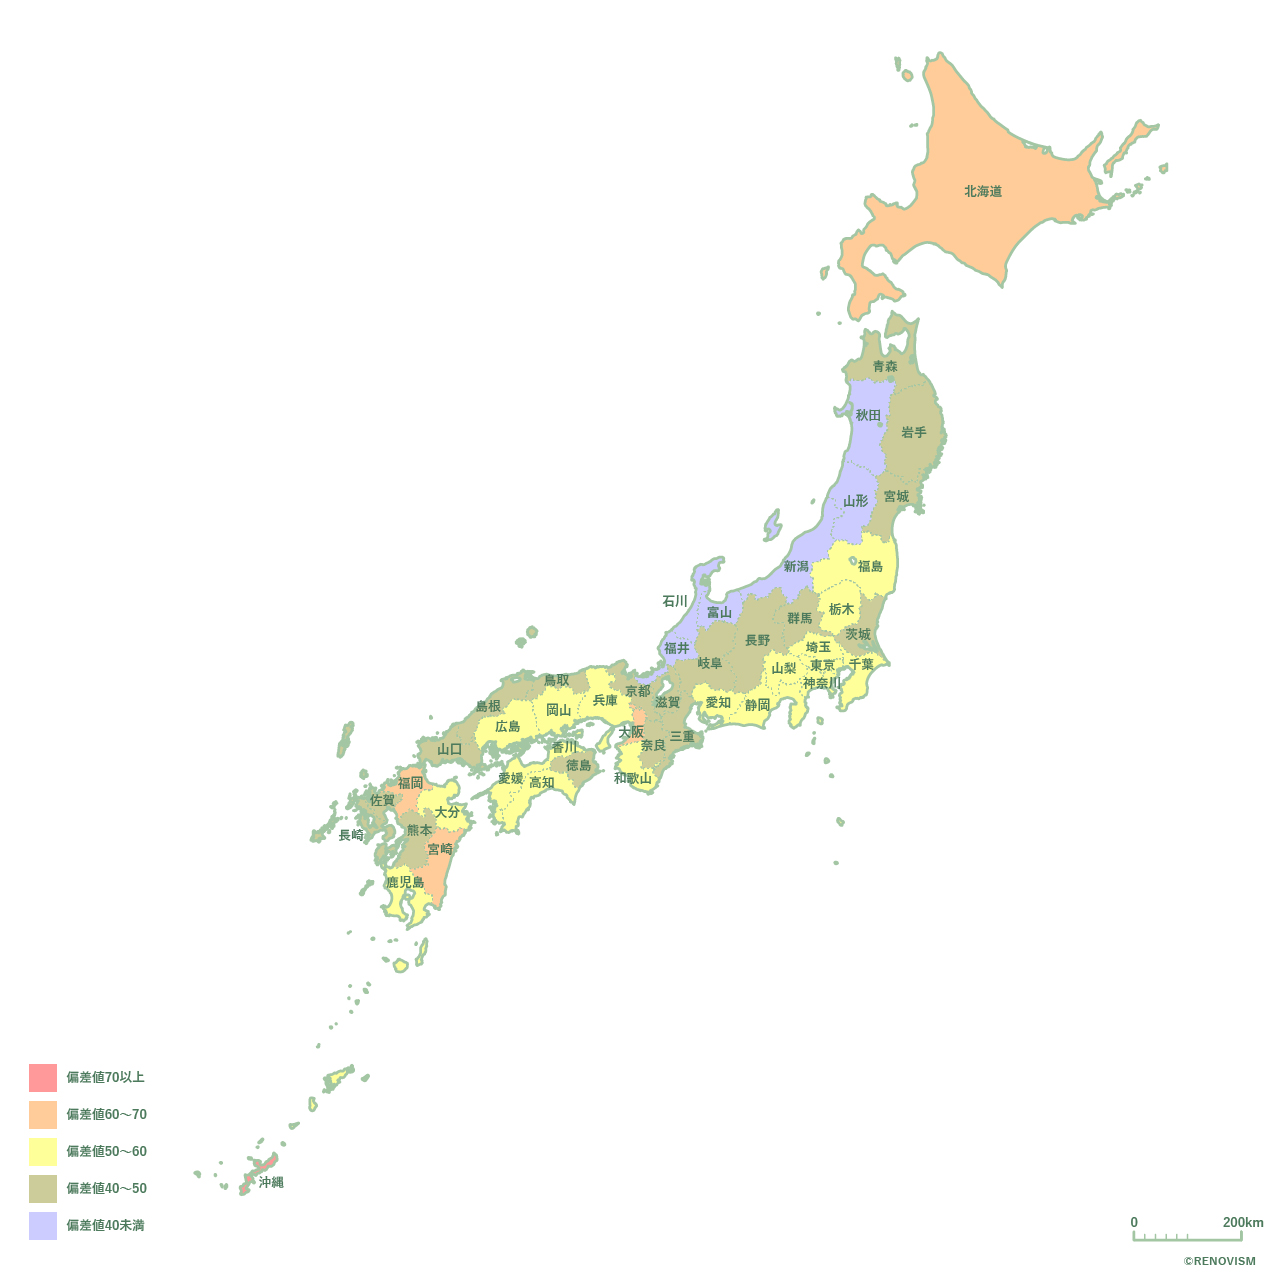 47都道府県別【離婚率マップ】日本編 2020年